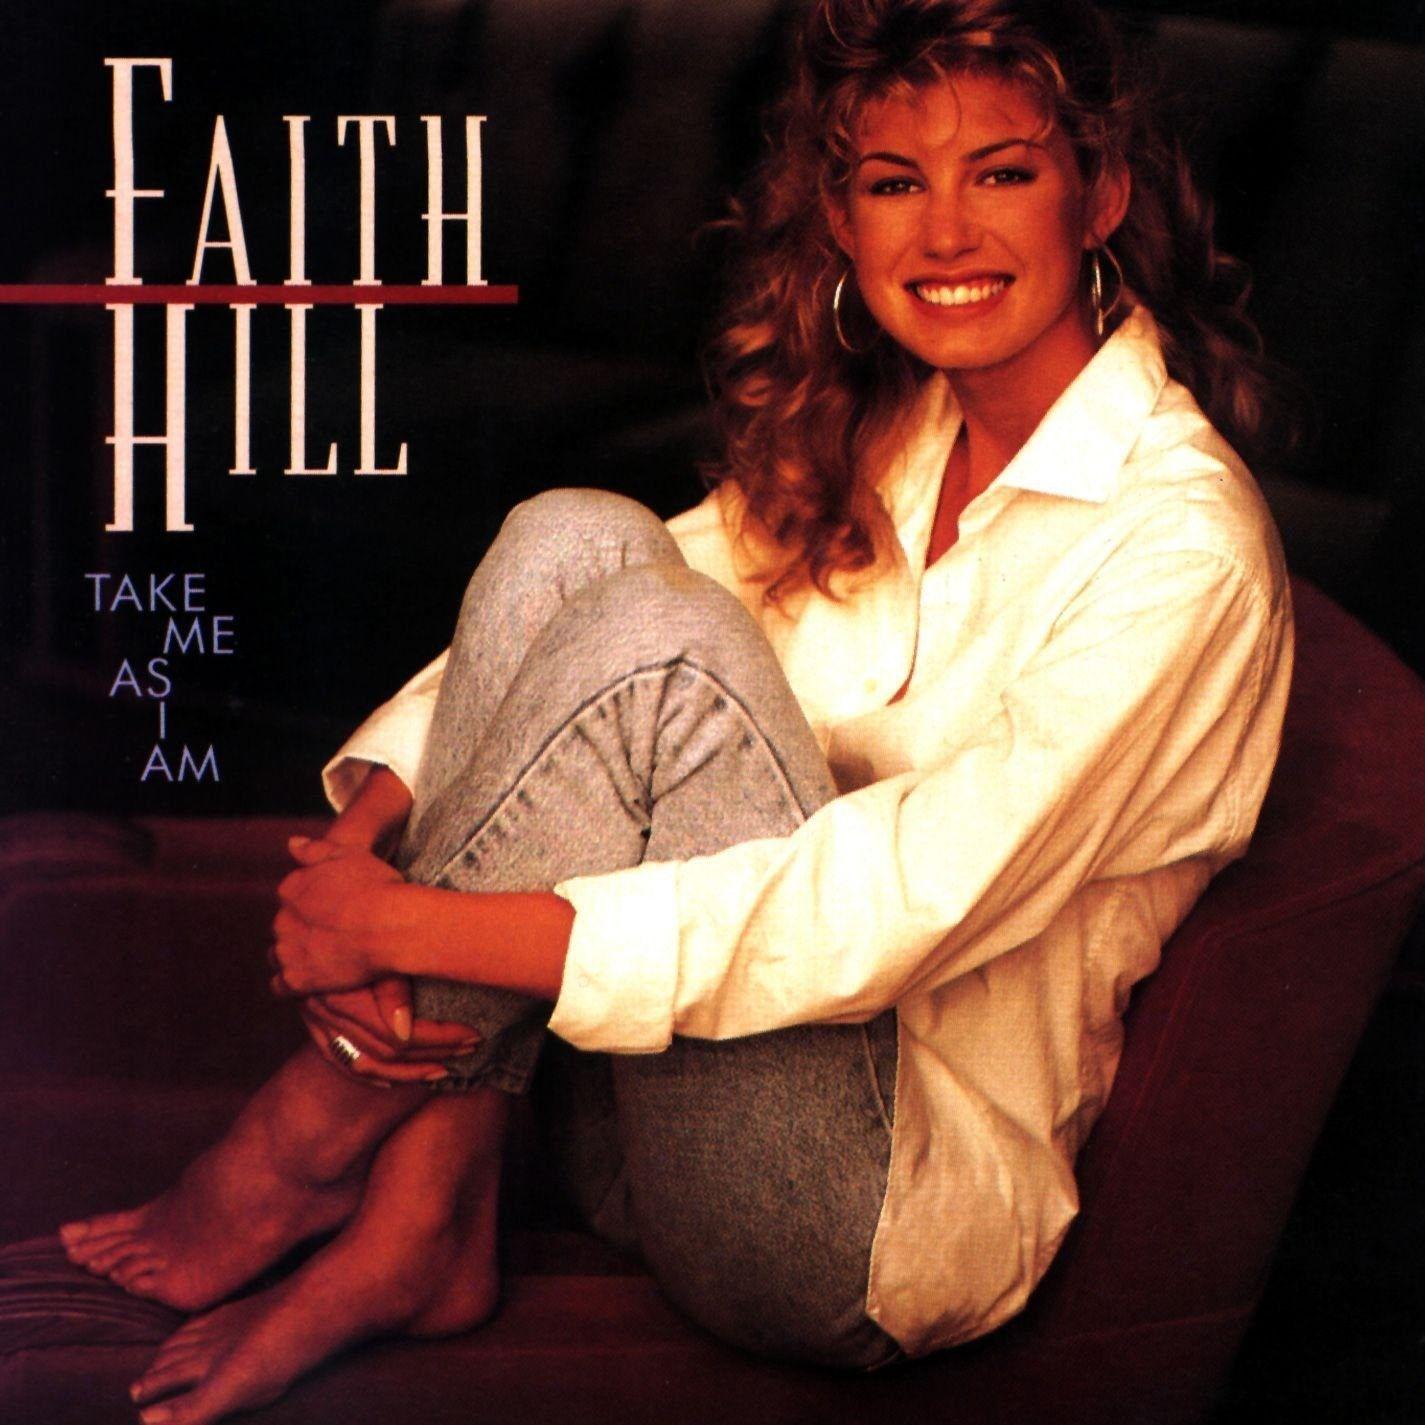 Faith Hill - Take Me As I Am Album Cover